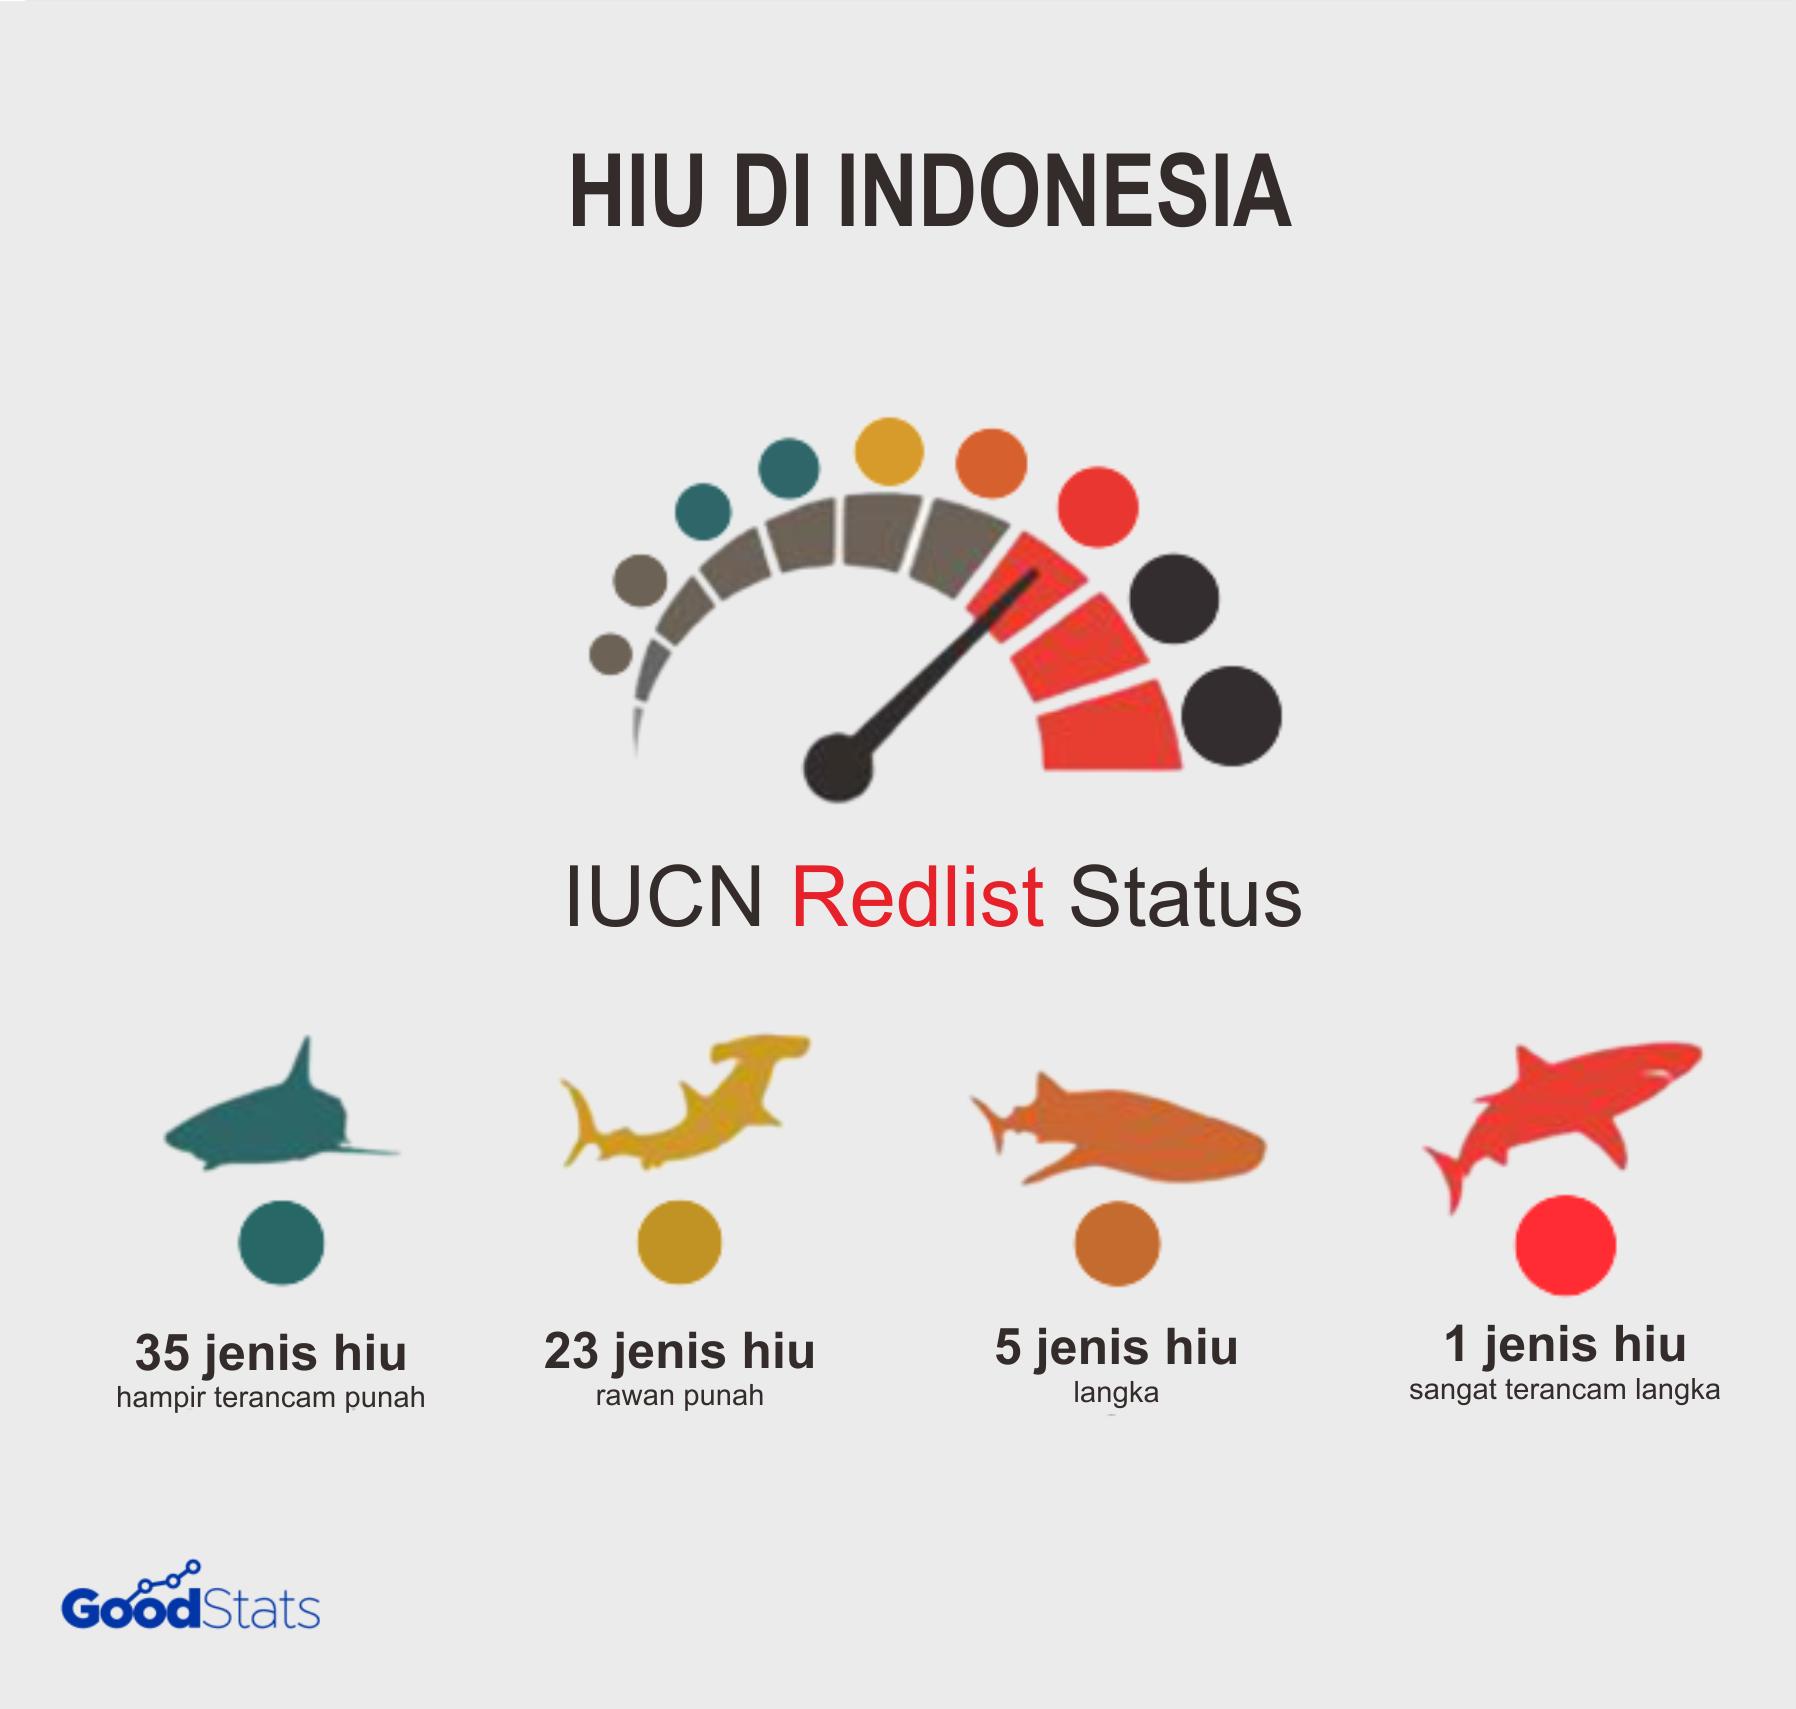 Hiu Pari di Indonesai | GoodStats